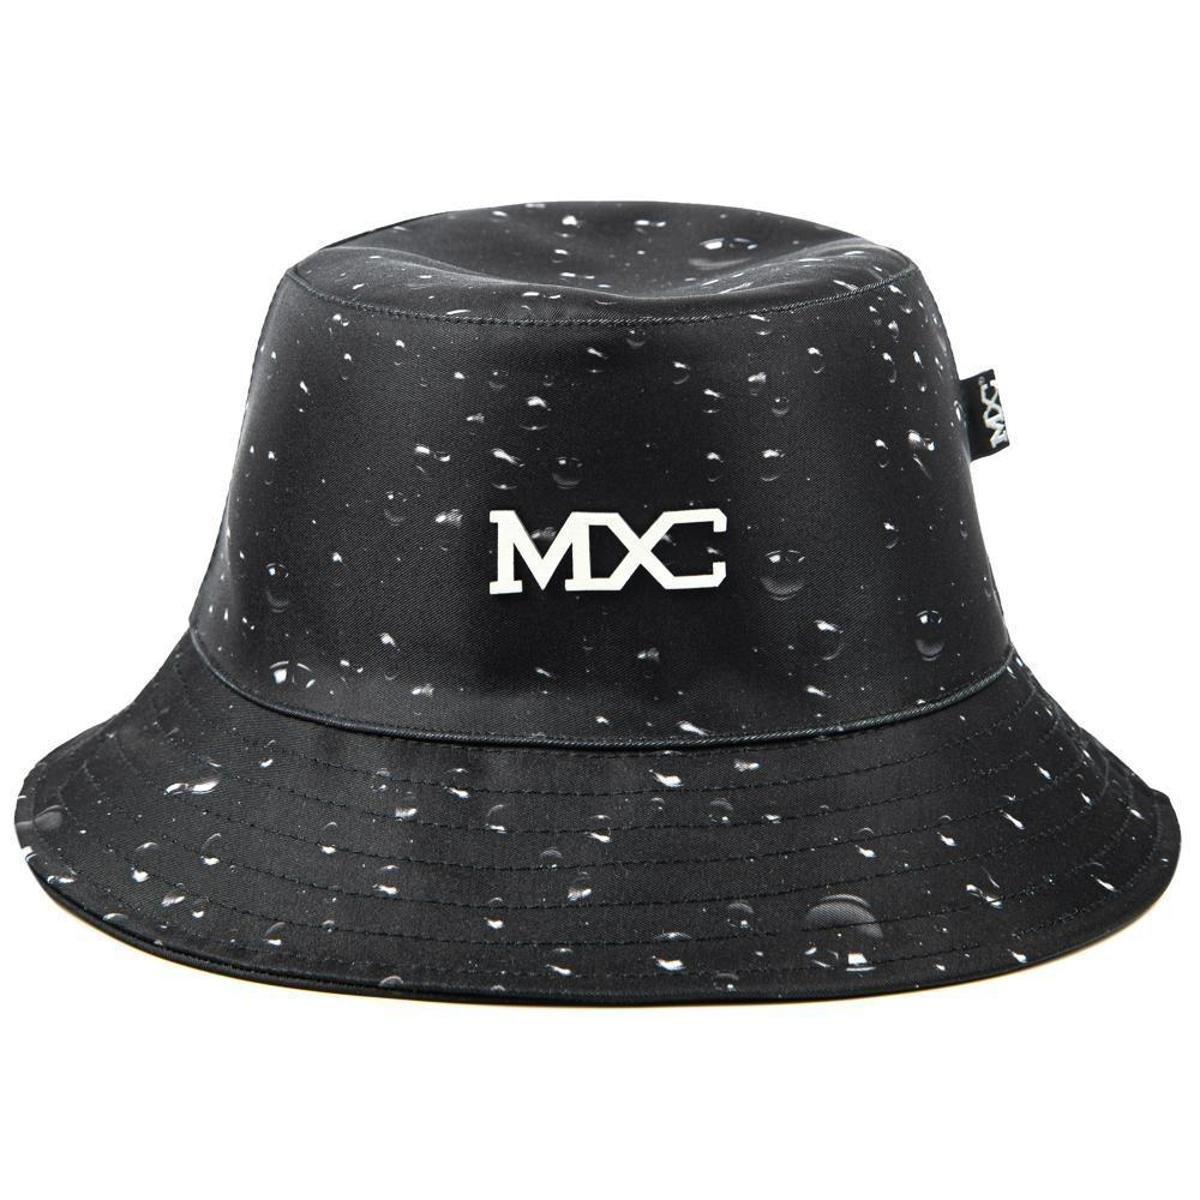 Chapeu Bucket Hat Mxc Brasil Estampado Style Preto Zattini